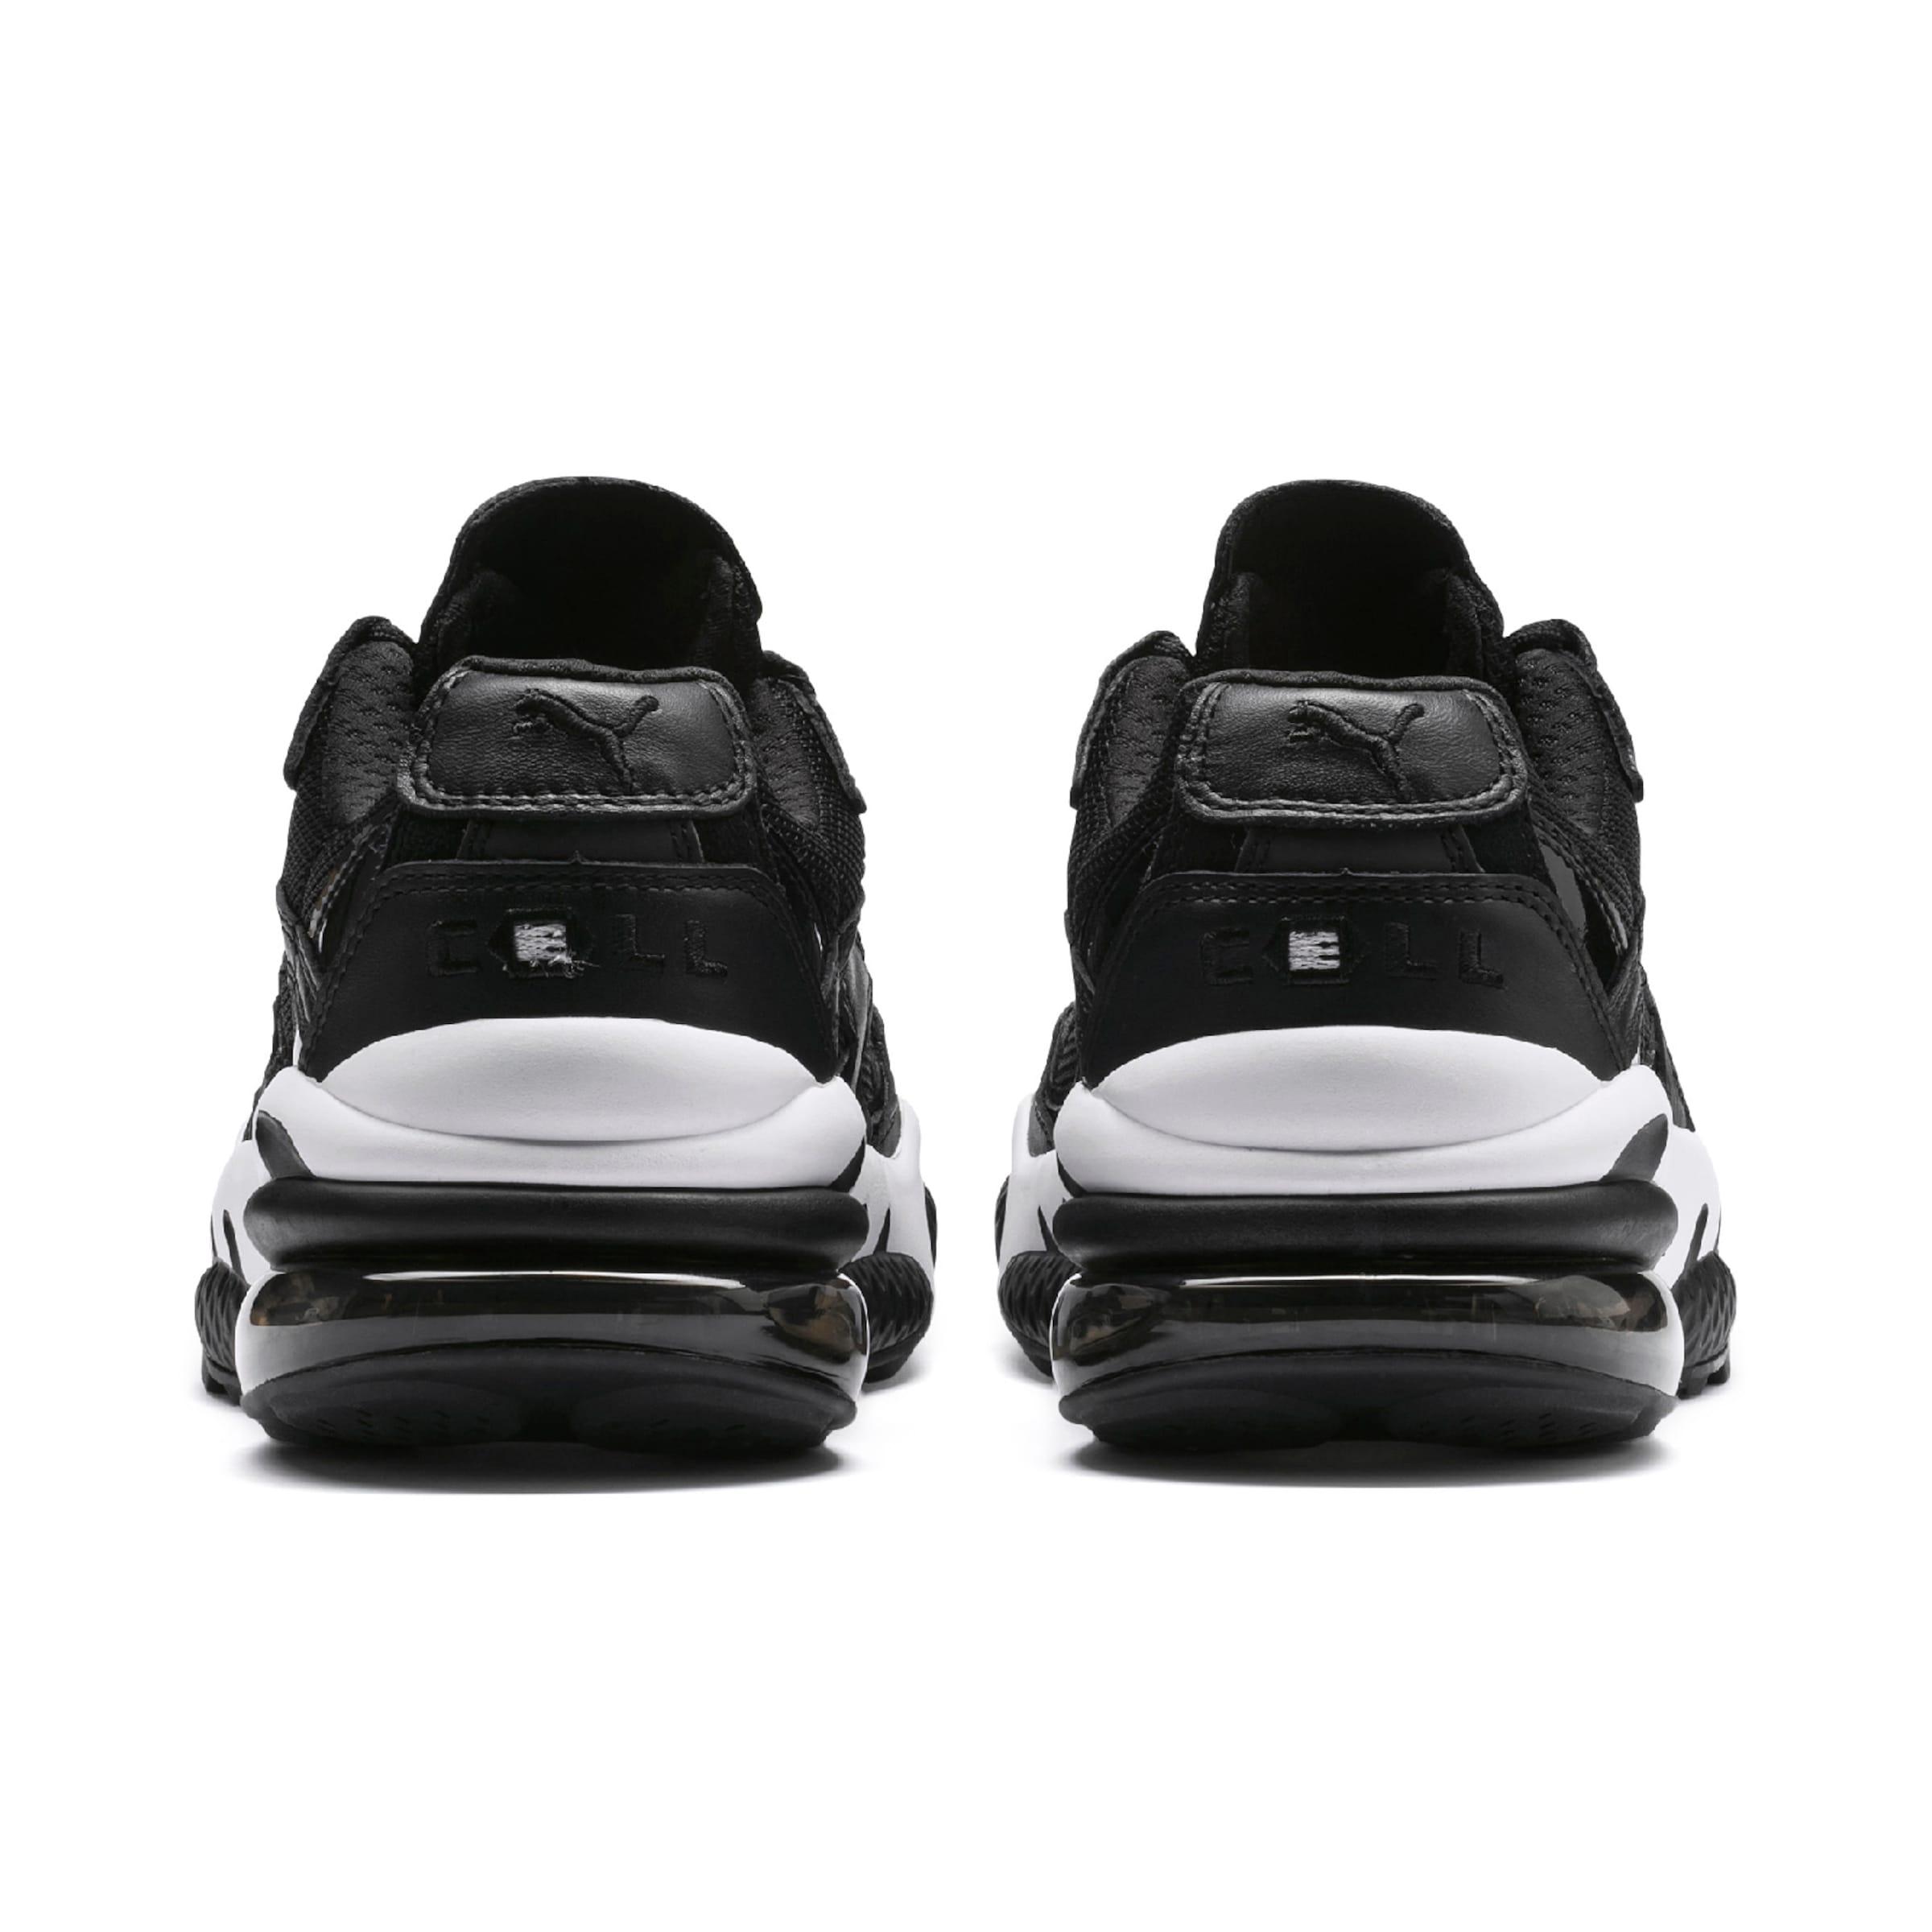 'cell Puma Sneaker Venom In SchwarzWeiß Reflective' Iyvb6gYmf7